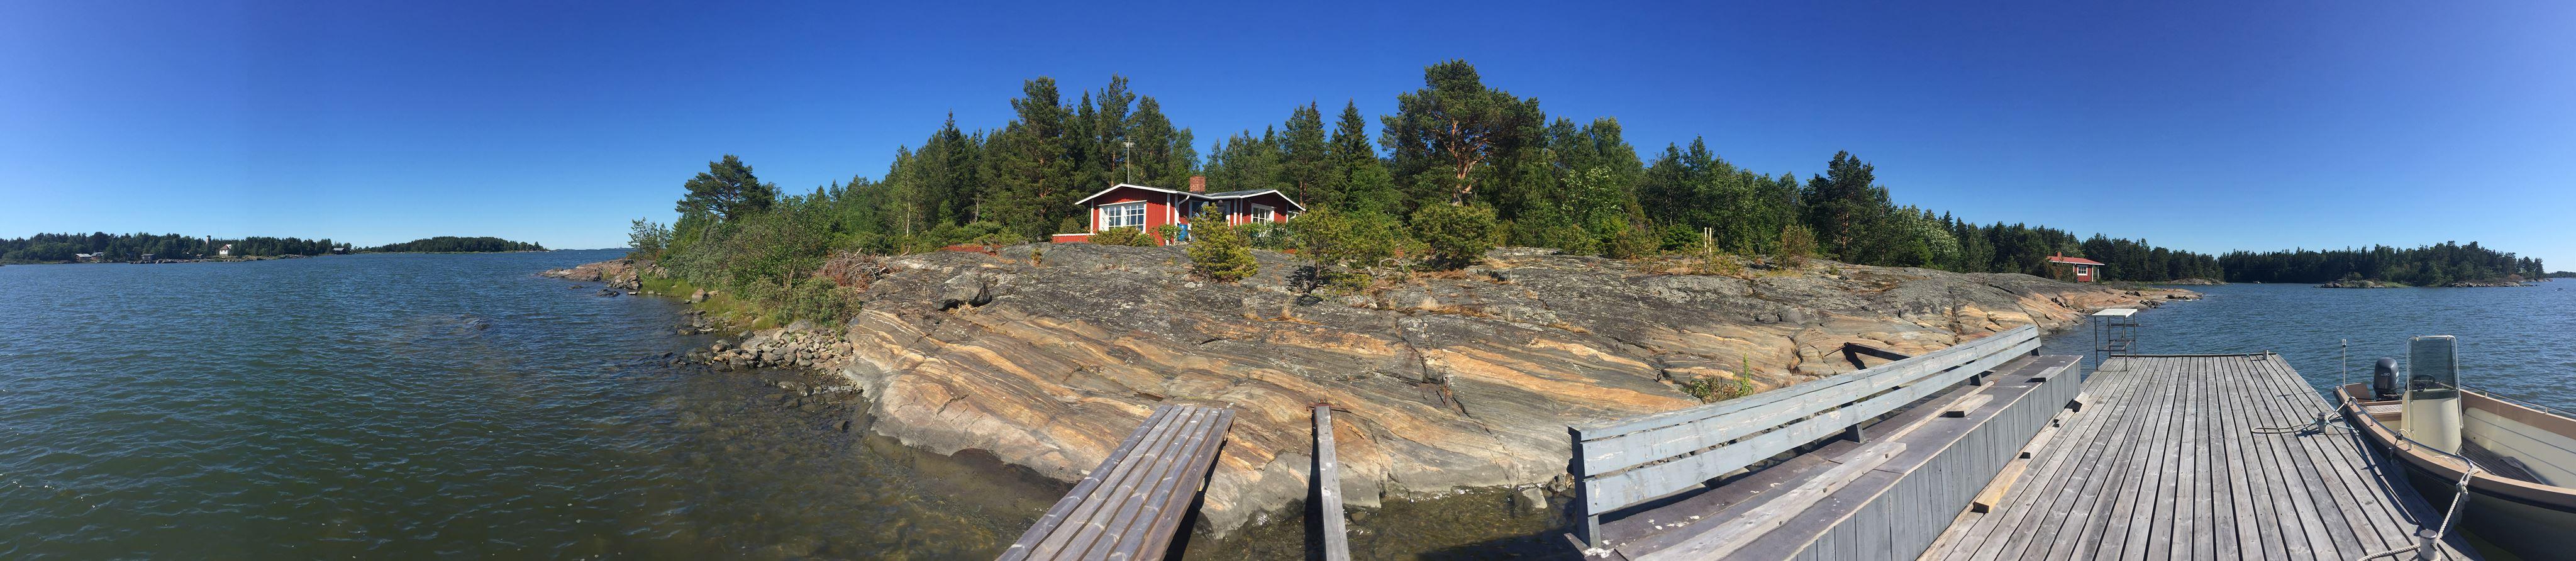 Kstad_island